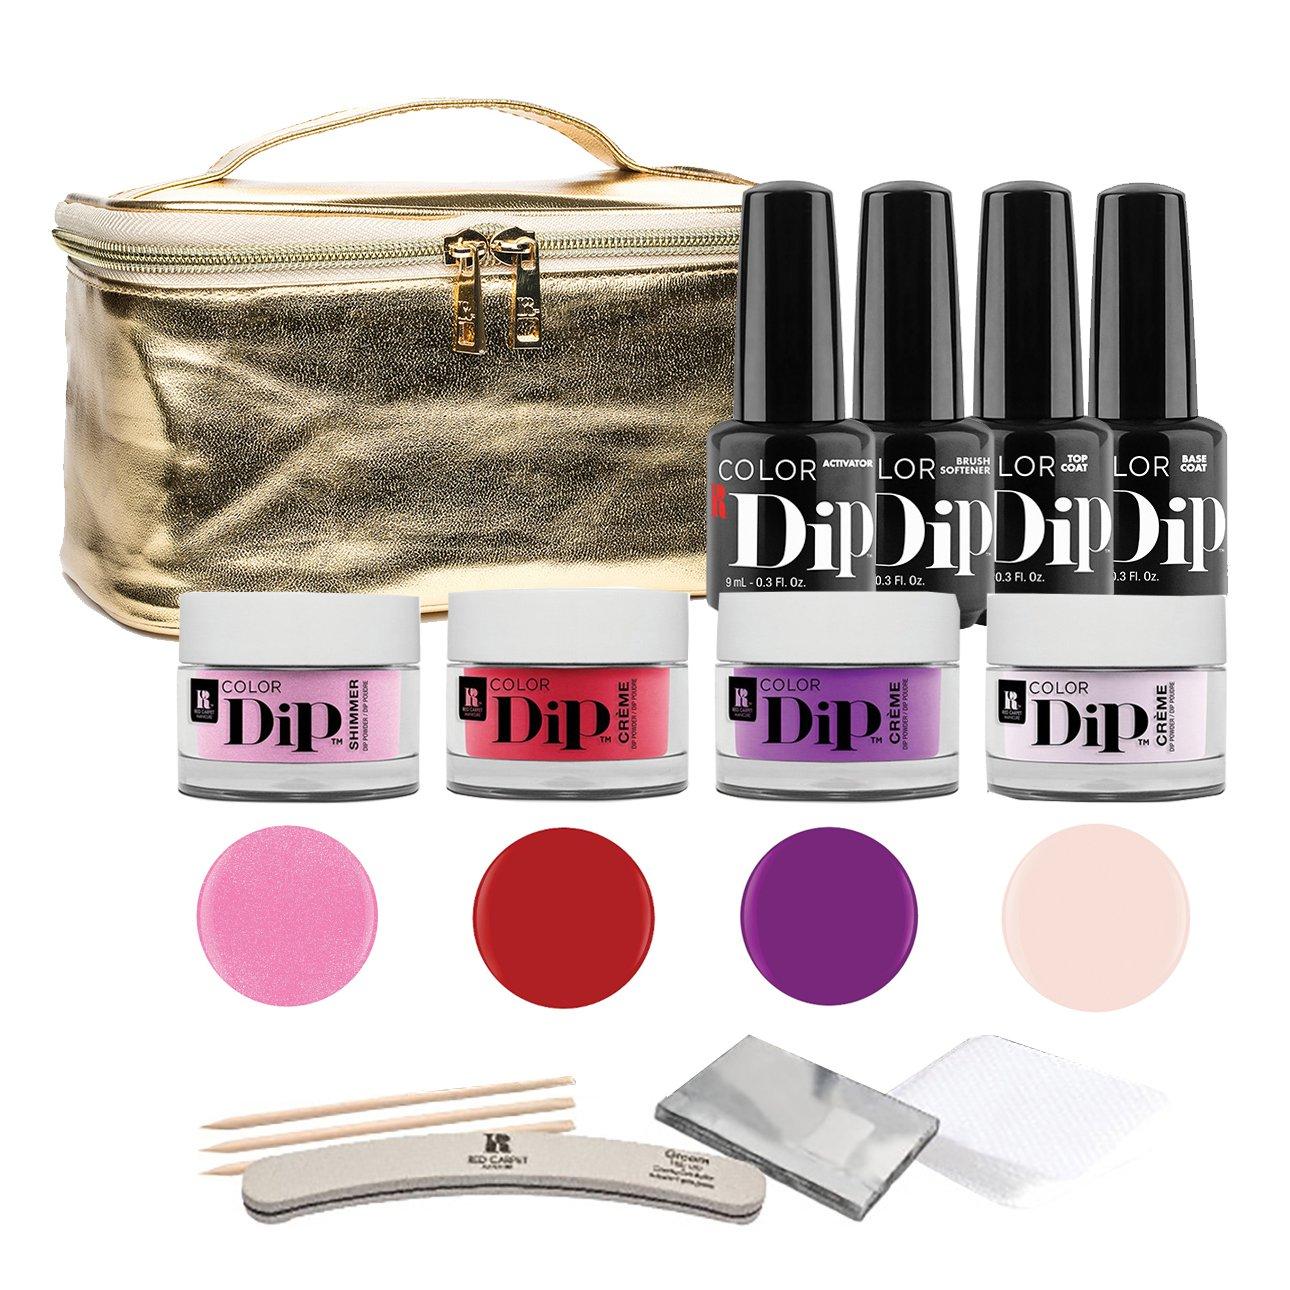 Red Carpet Manicure Color Dip Nail Powder Starter Kit | Purple, Red, & Pink